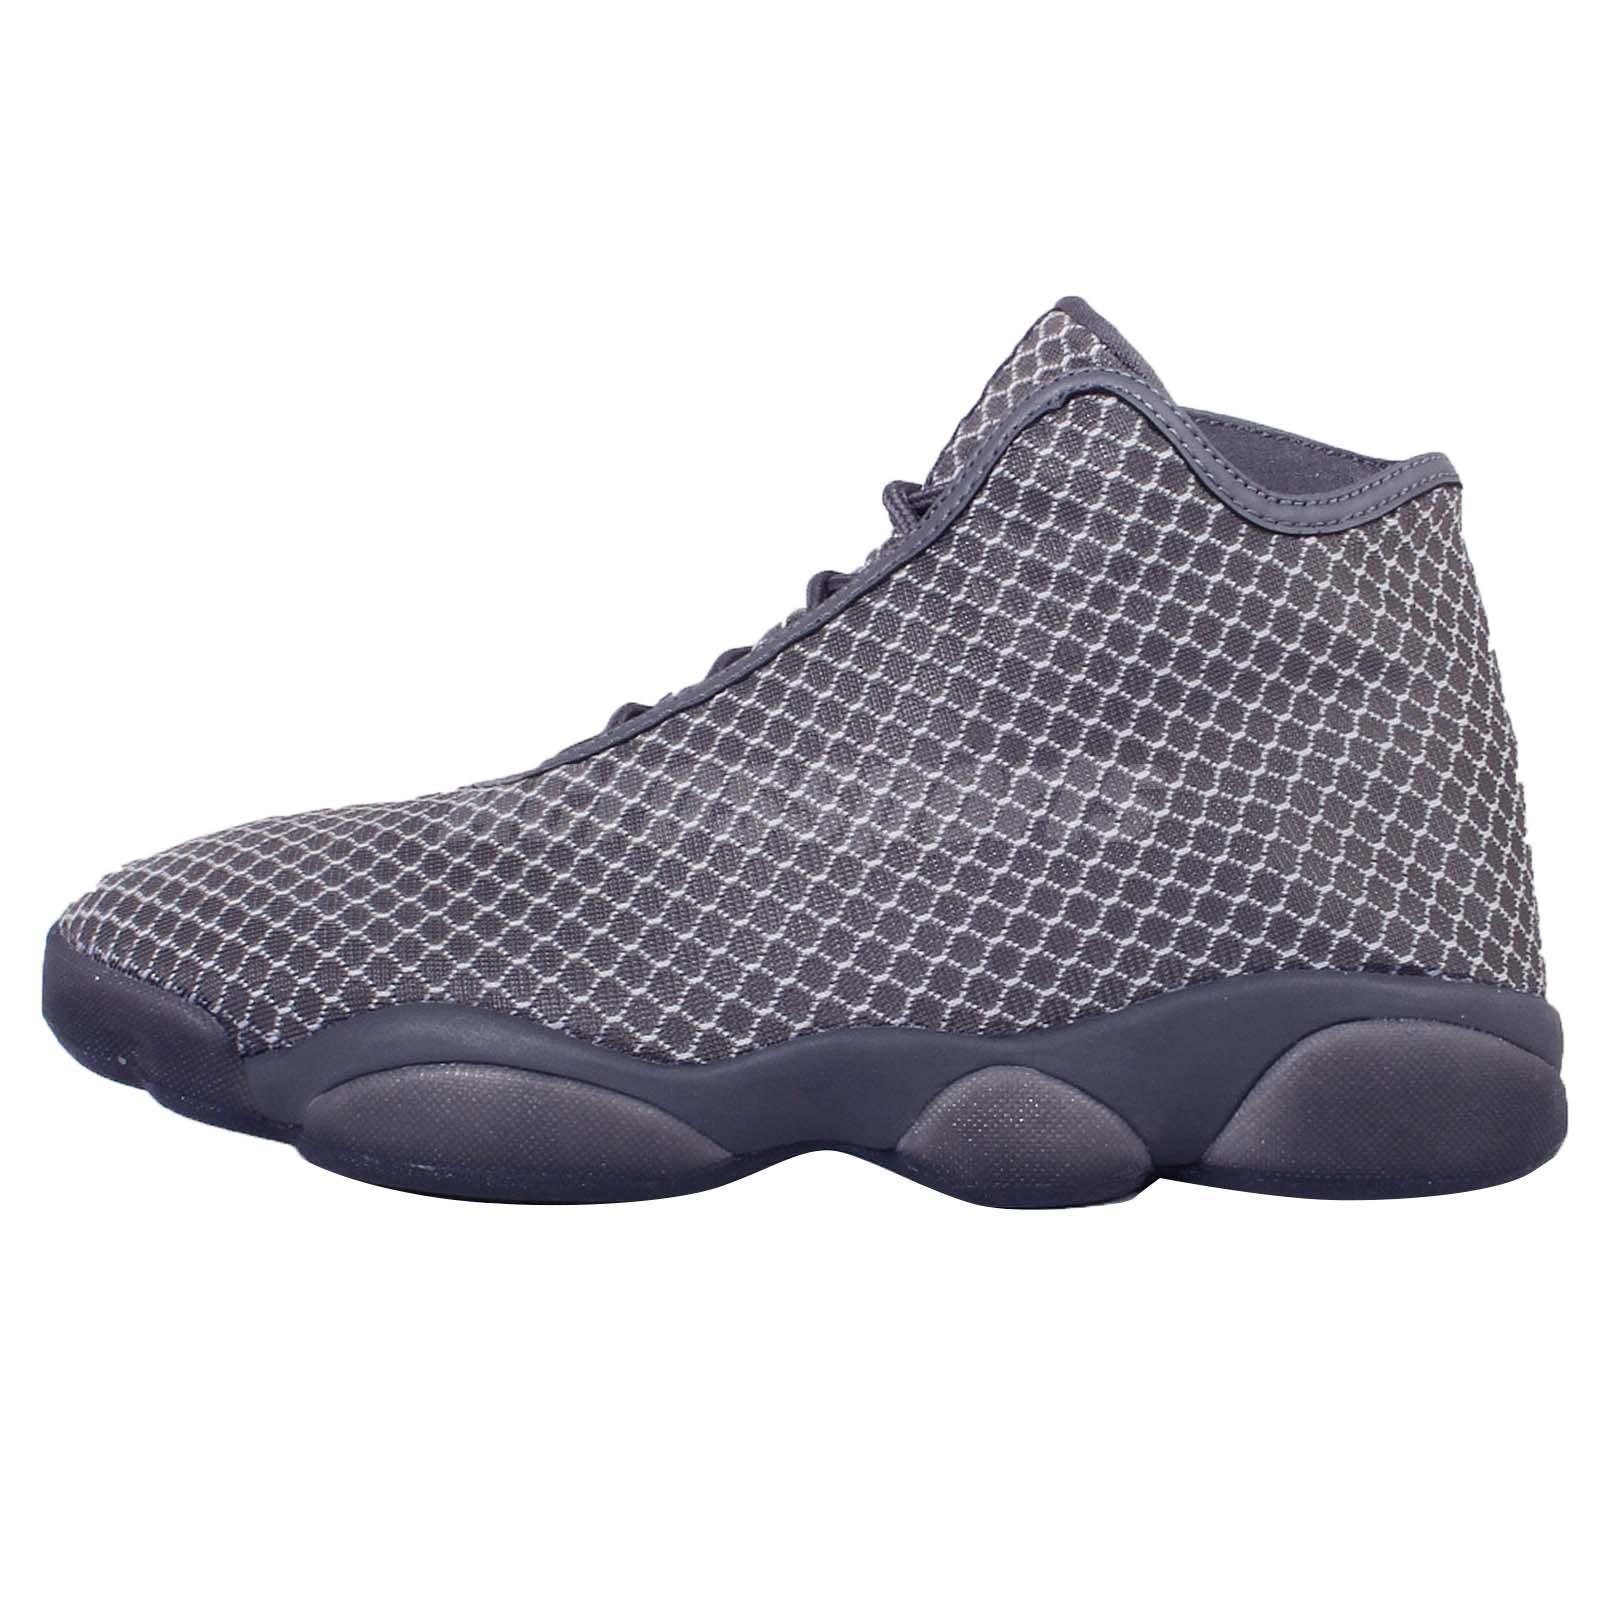 the latest 2adf9 44772 cheap nike jordan horizon air 13 xiii future wolf grey white sneakers  823581 003 5b51e ea845